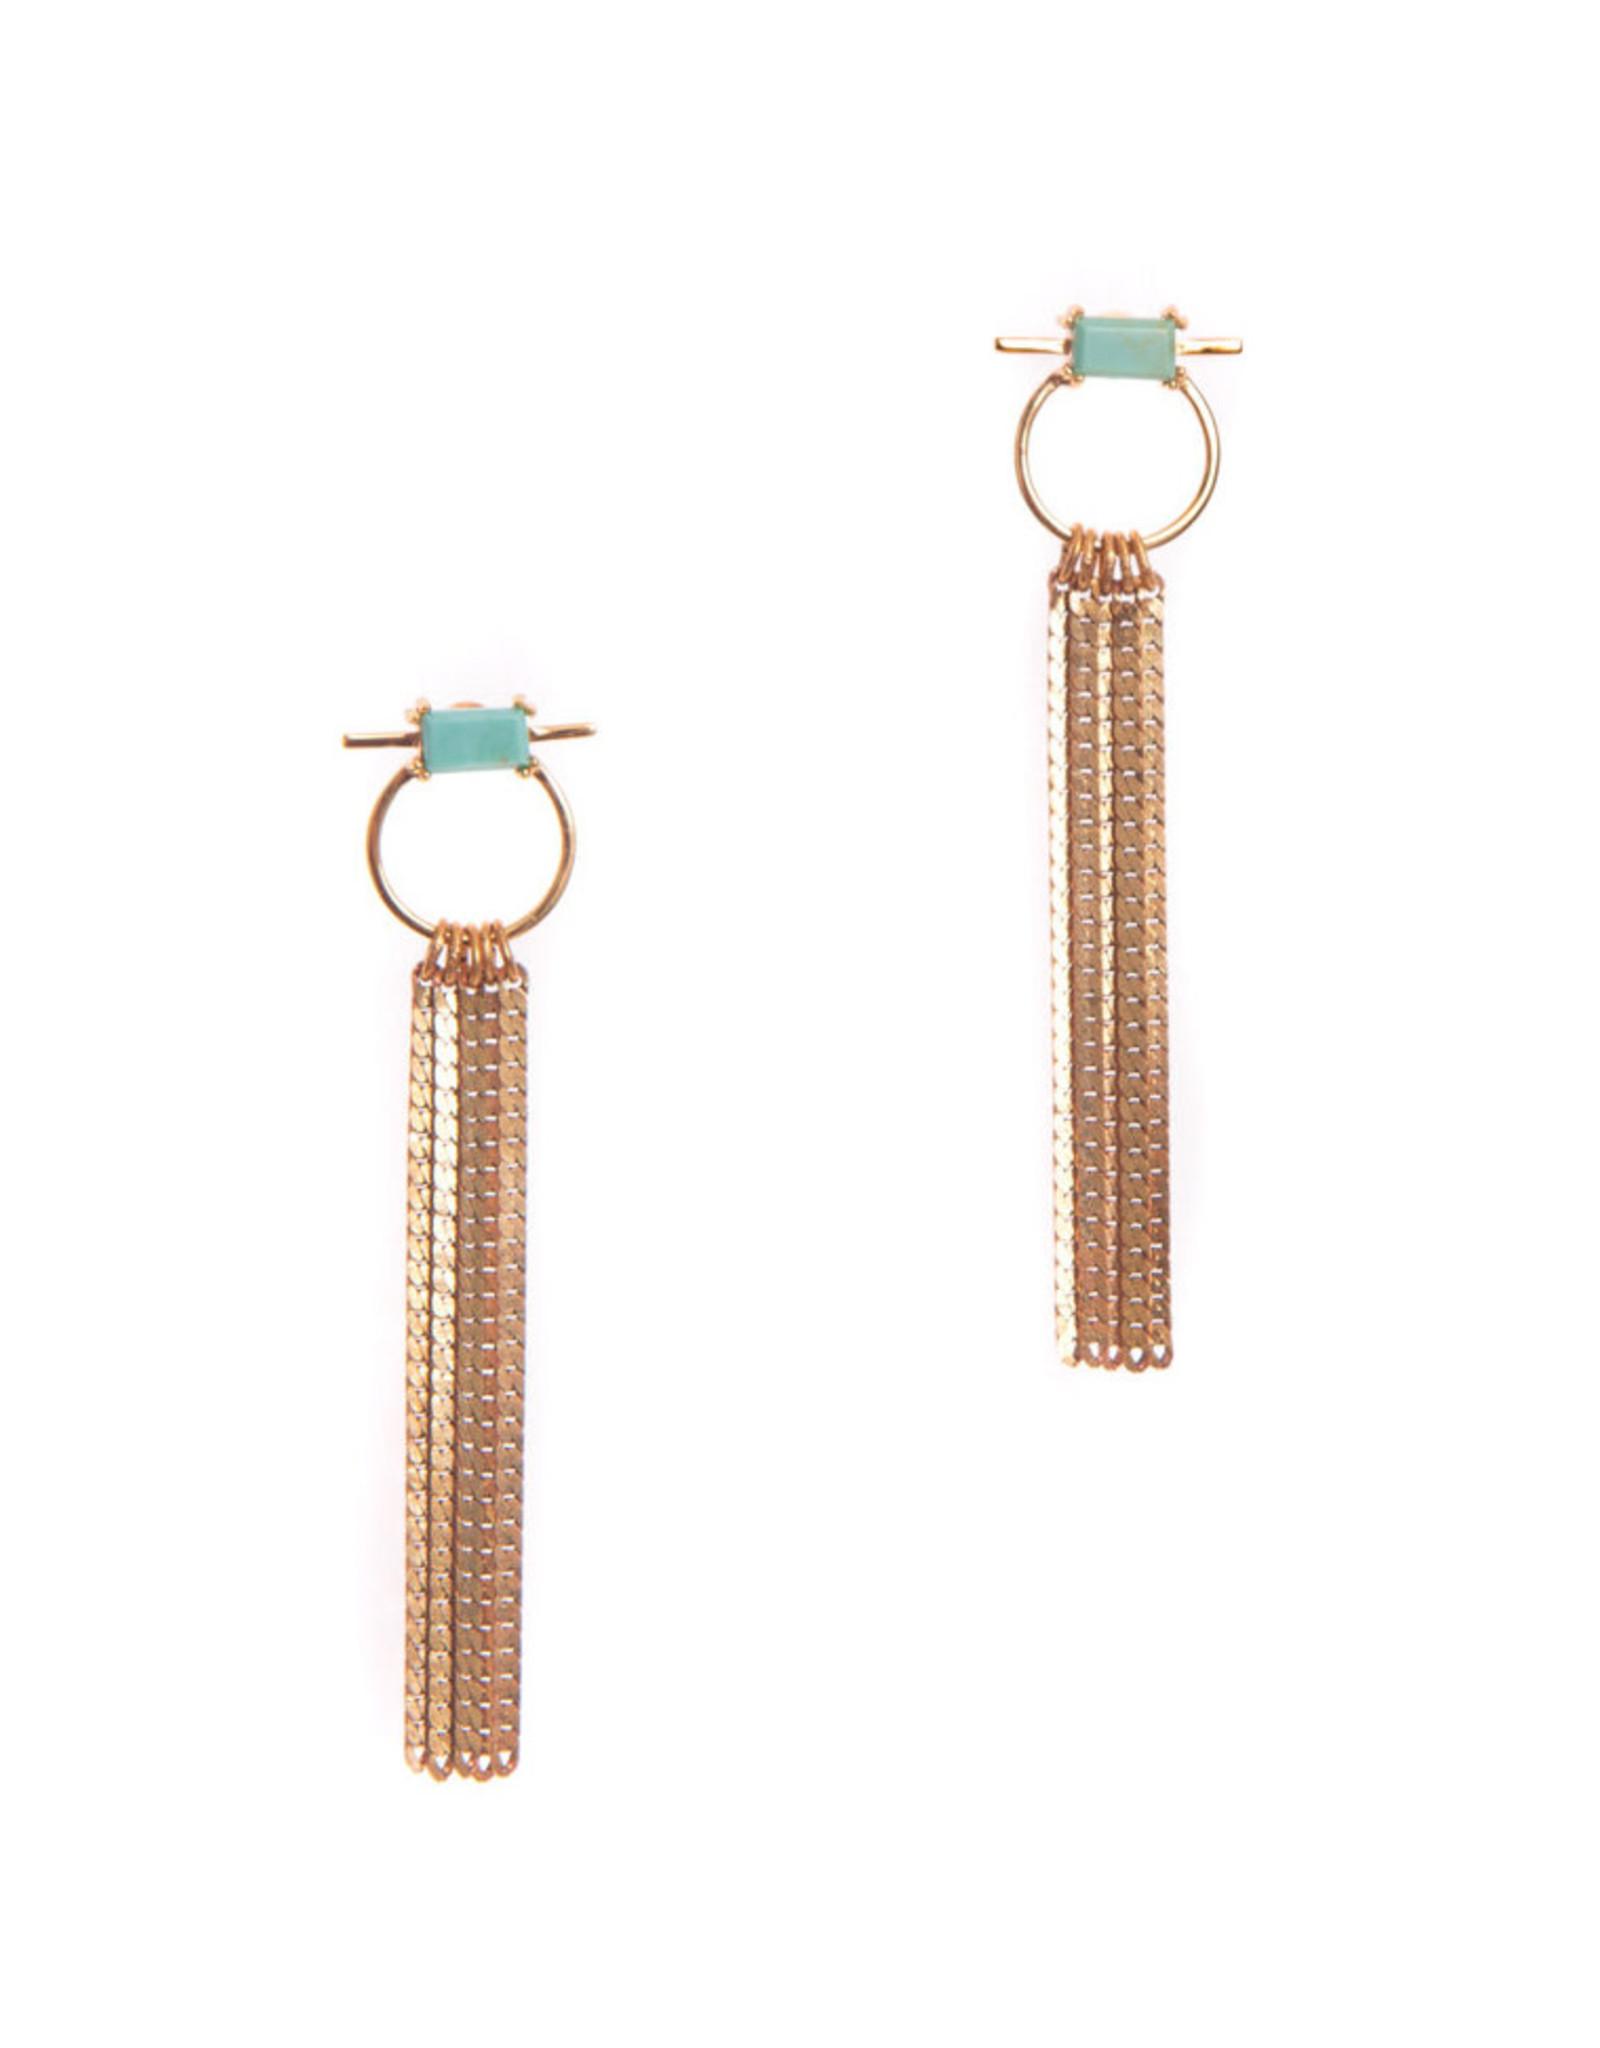 Hailey Gerrits Designs Capri Earrings - Green Turquoise